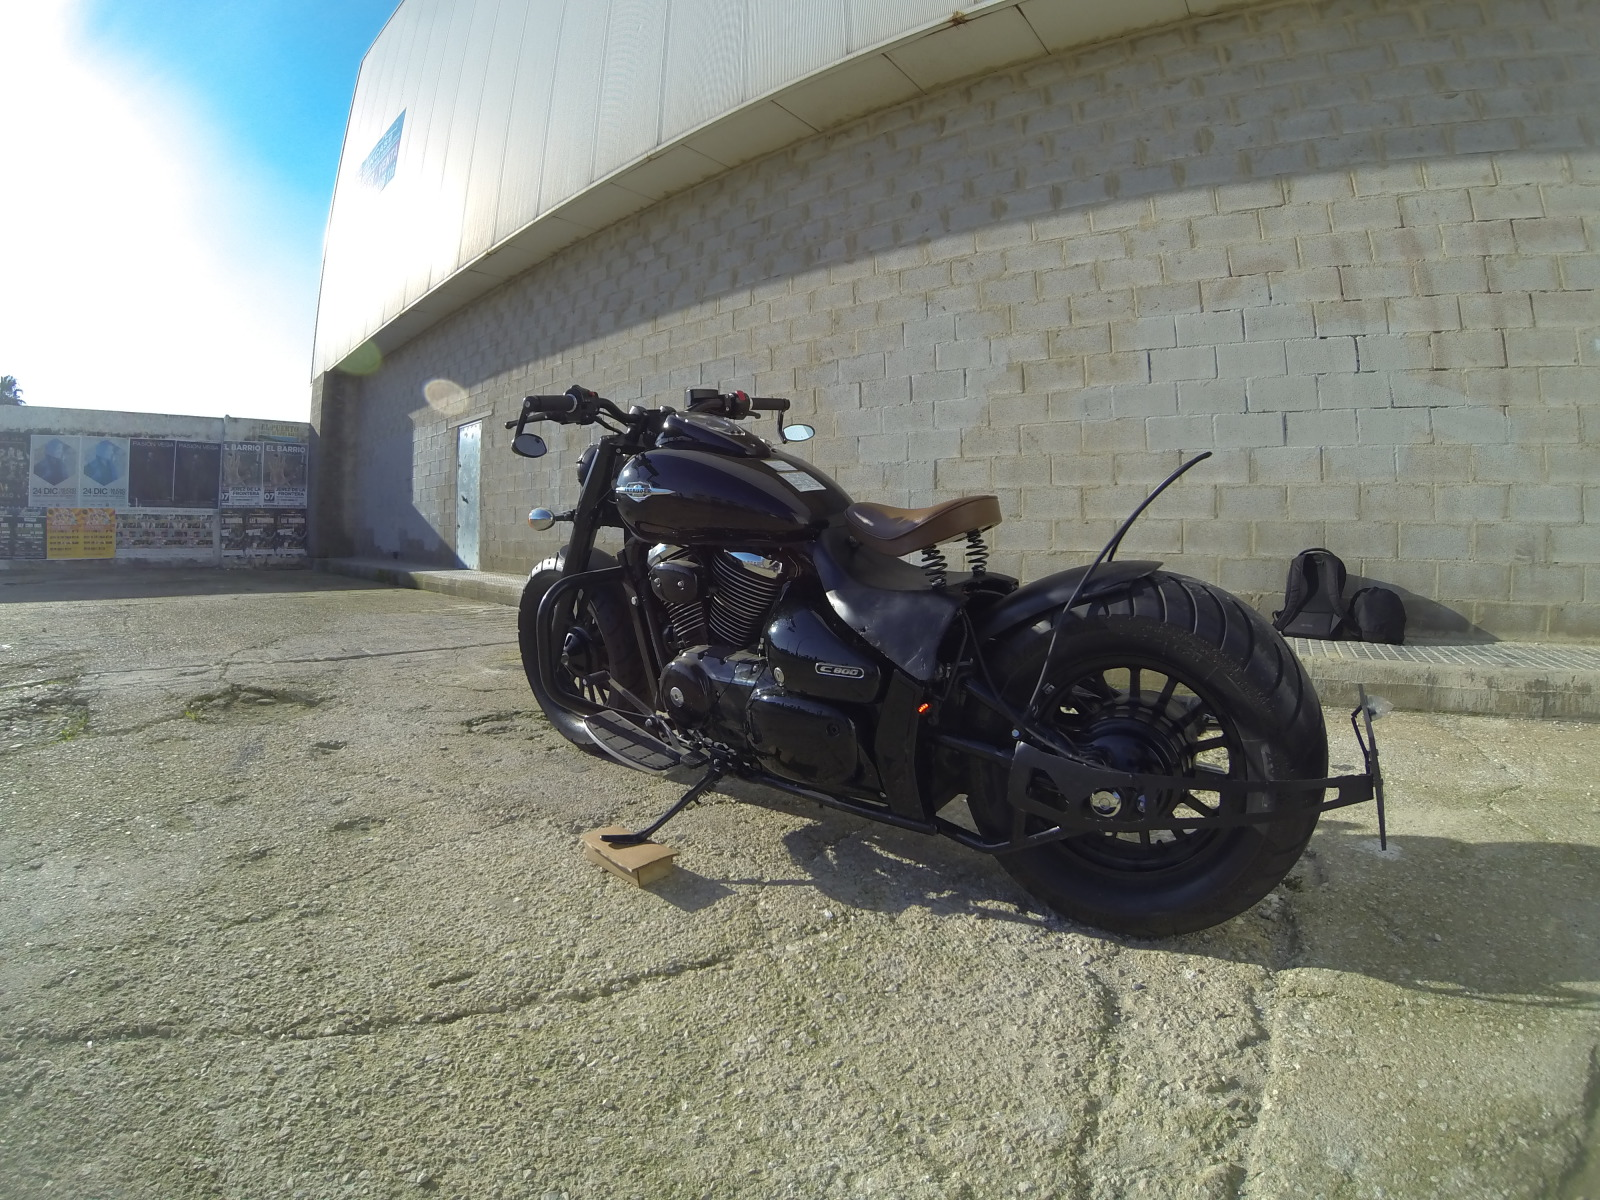 My Intruder c800 black edition bobber project 2ahhzxk